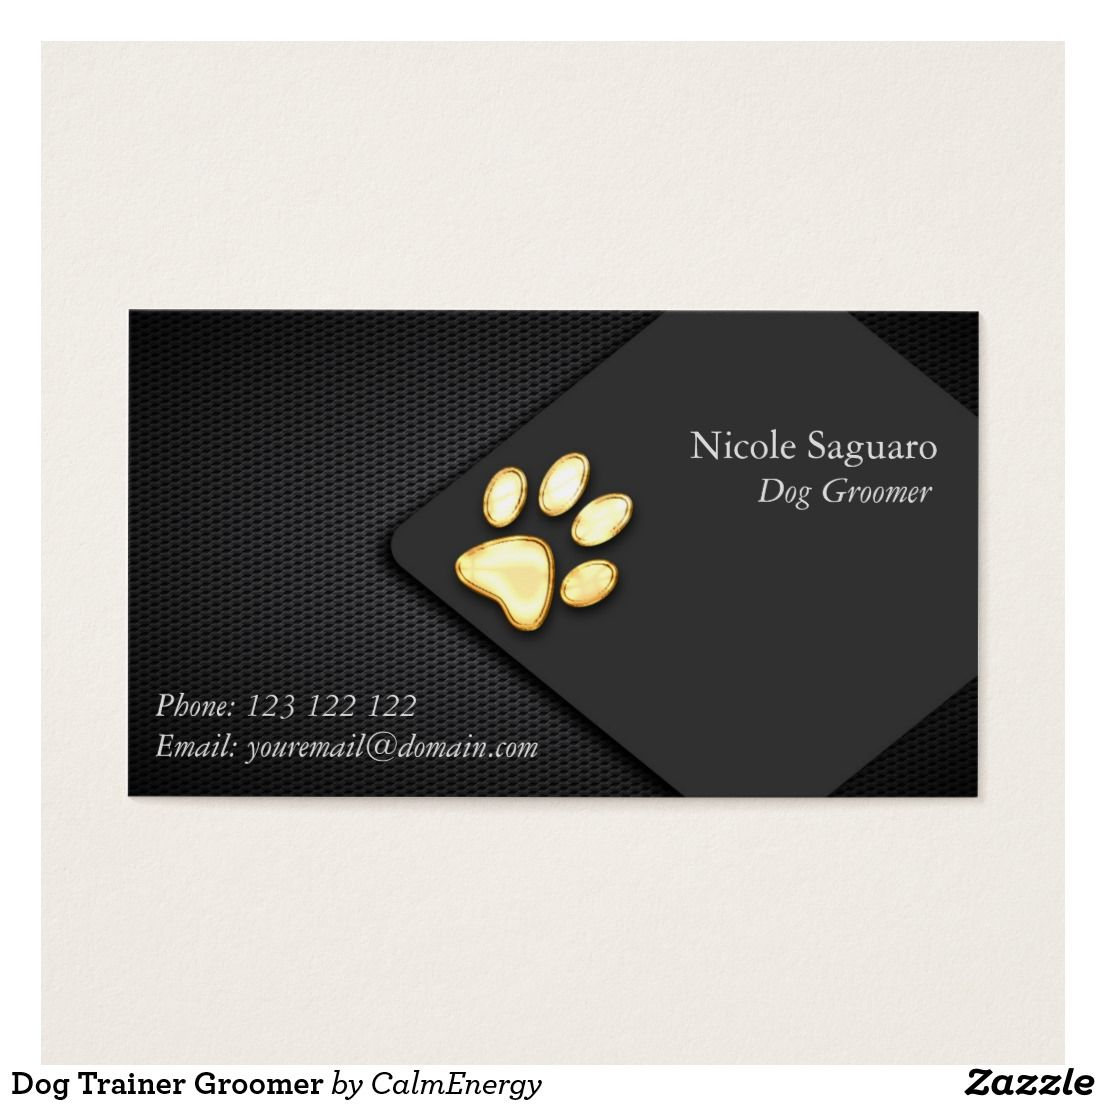 Dog Trainer Groomer Business Card Zazzle.ca Dog